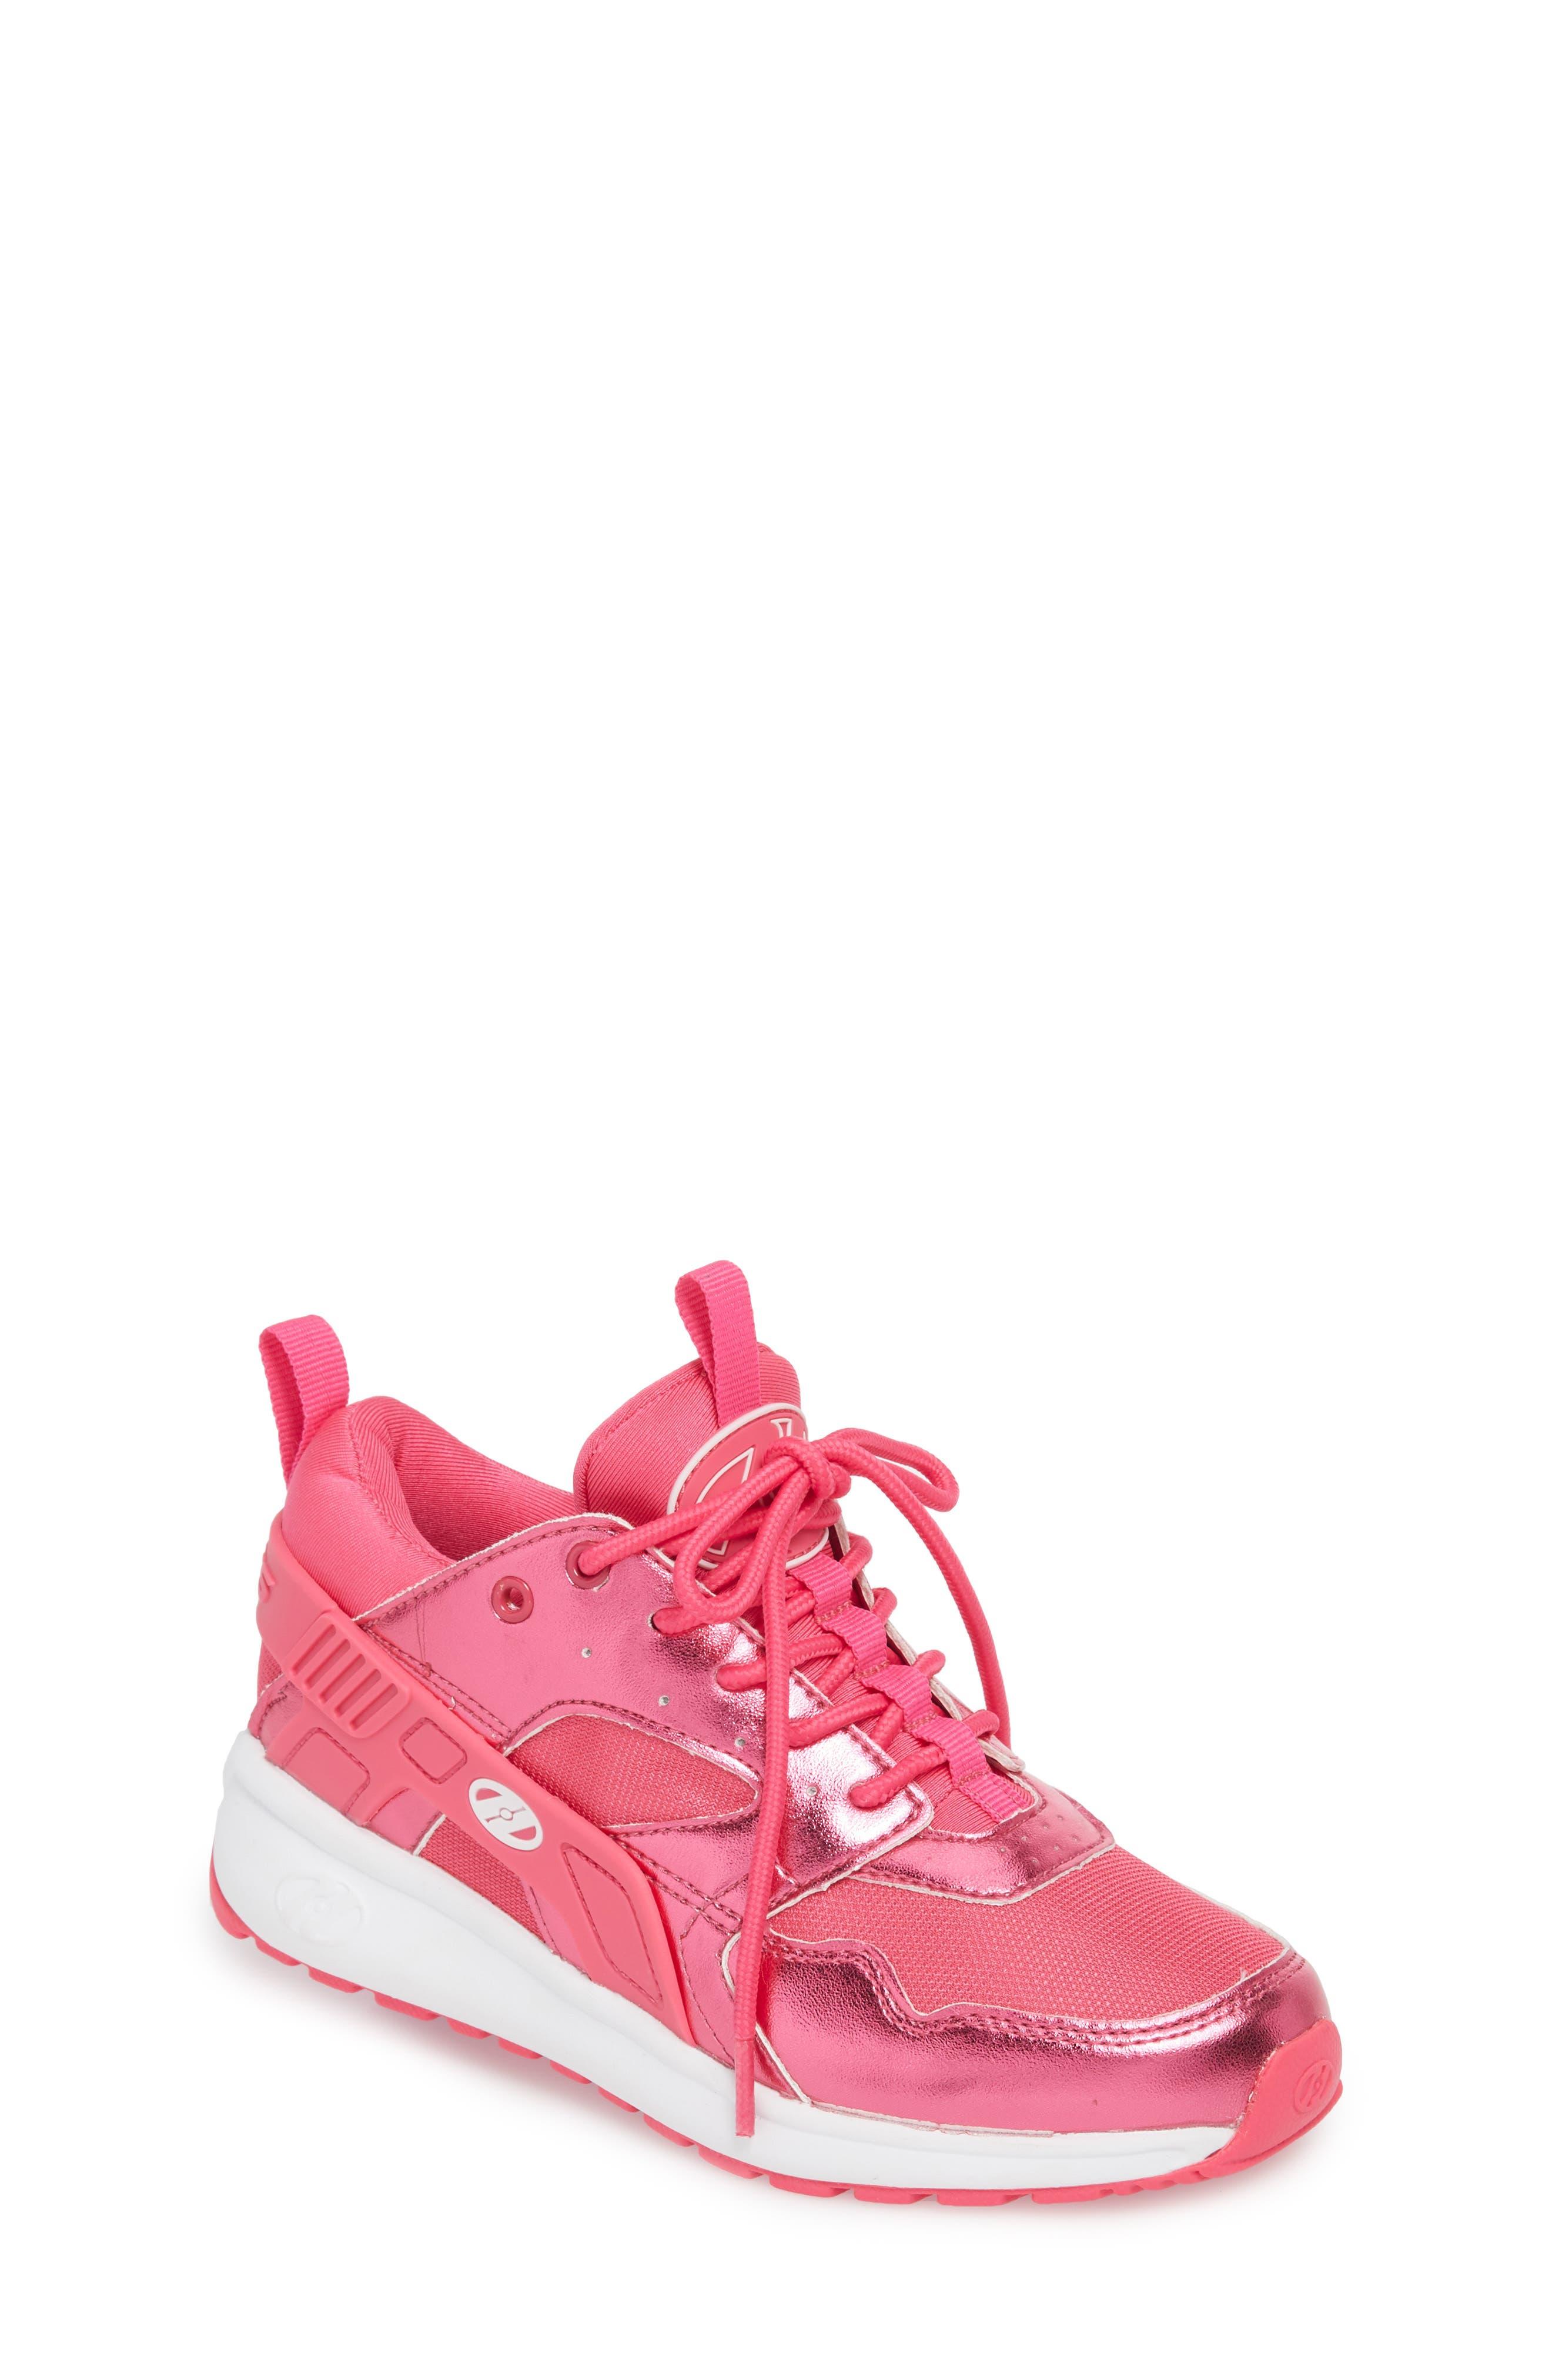 Force Sneaker,                             Main thumbnail 1, color,                             PINK